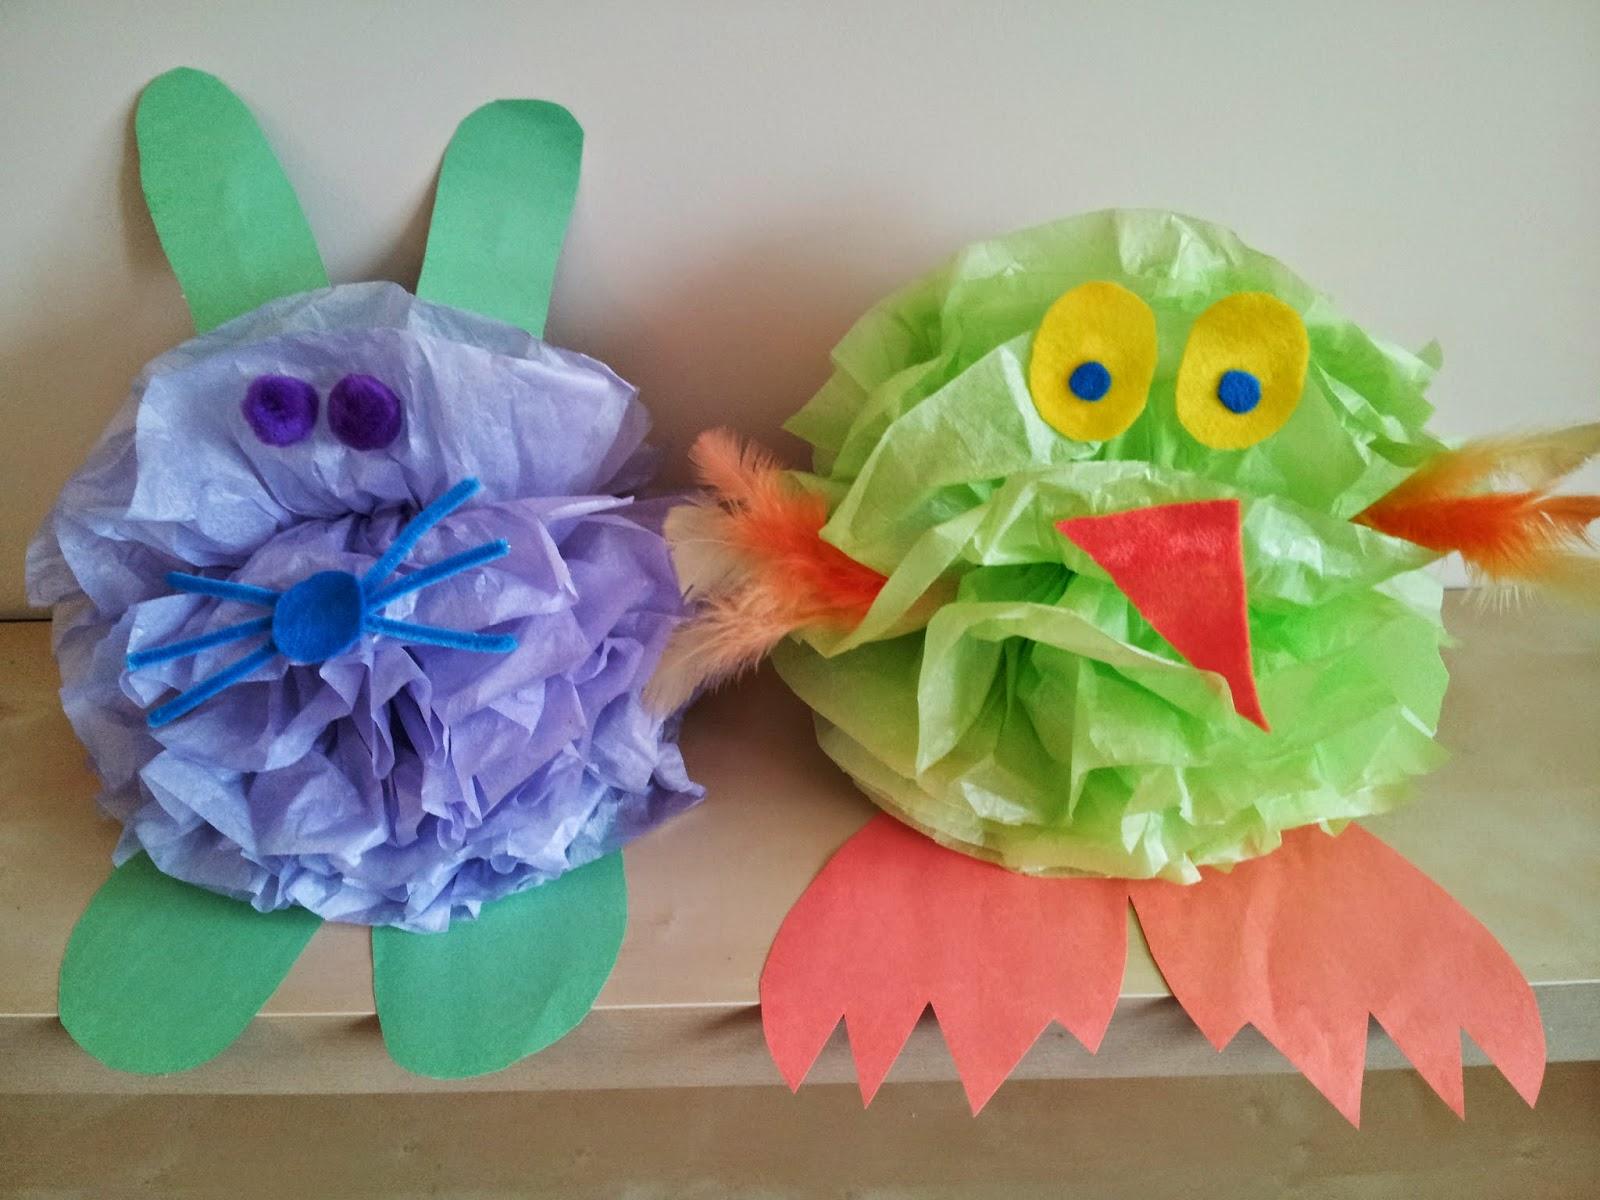 Easter chick craft, Easter bunny craft, tissue paper crafts, kids crafts